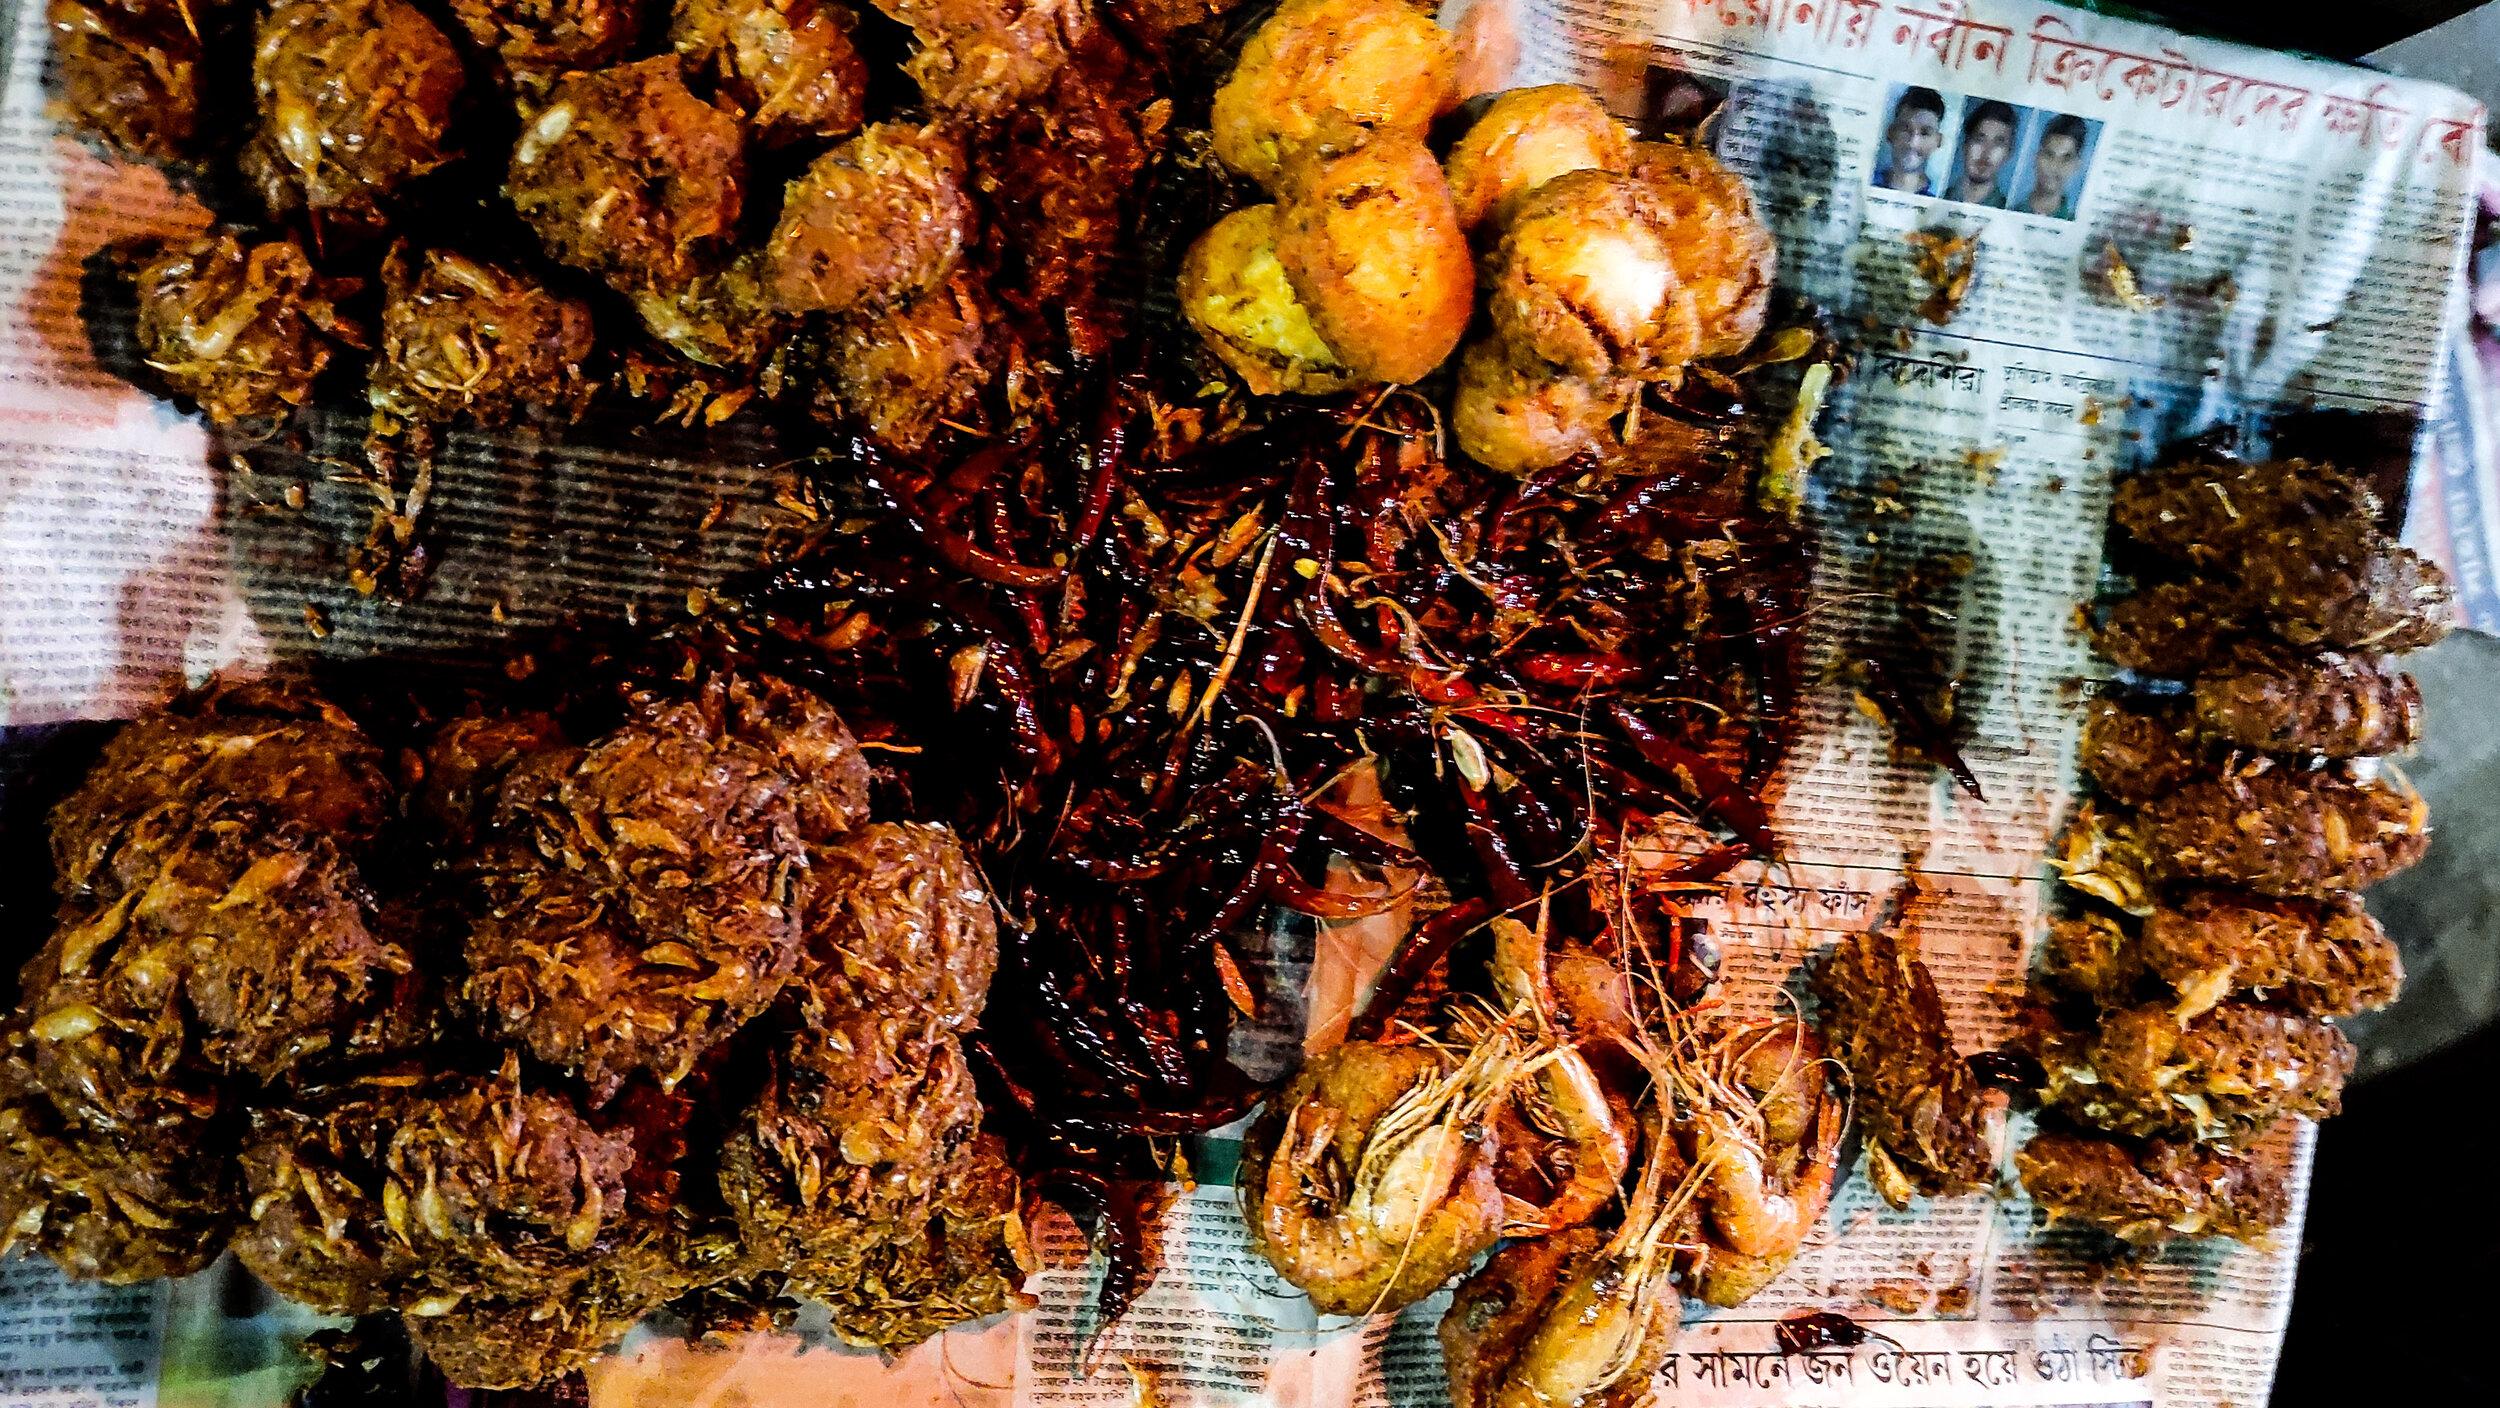 The traditional Bangladeshi foods Peyaju, Beguni, and Chop.